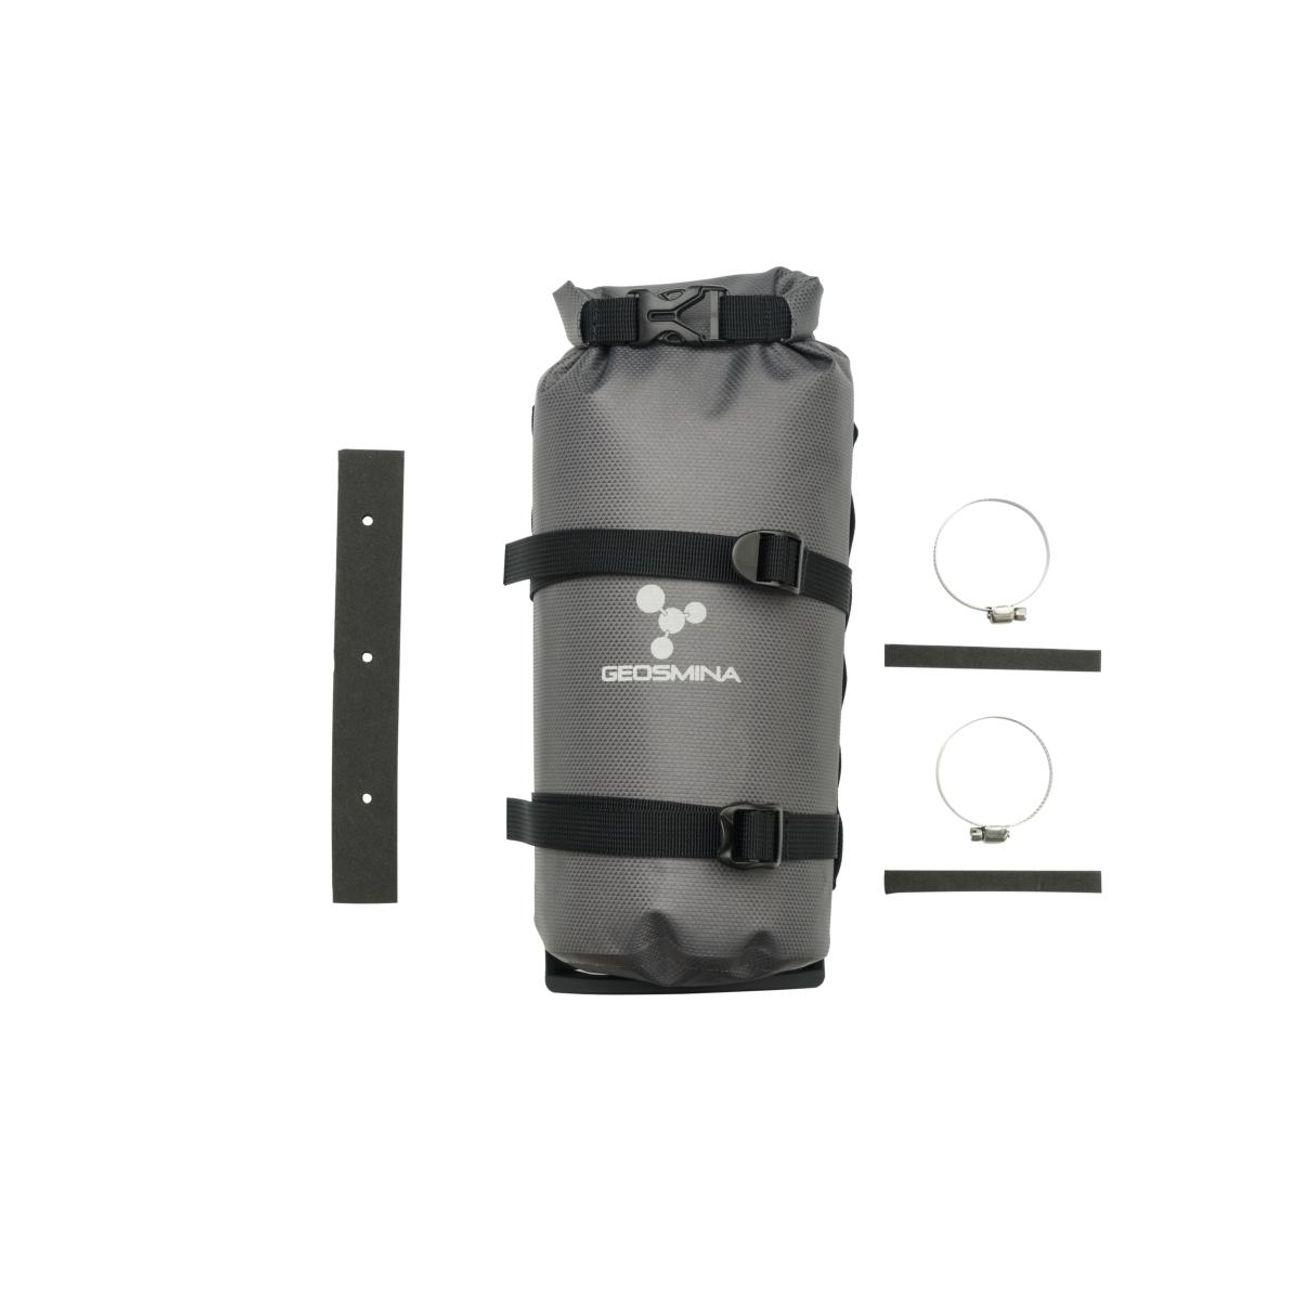 Vélo  Geosmina Geosmina - Cargo Cage Fork Bag 4L